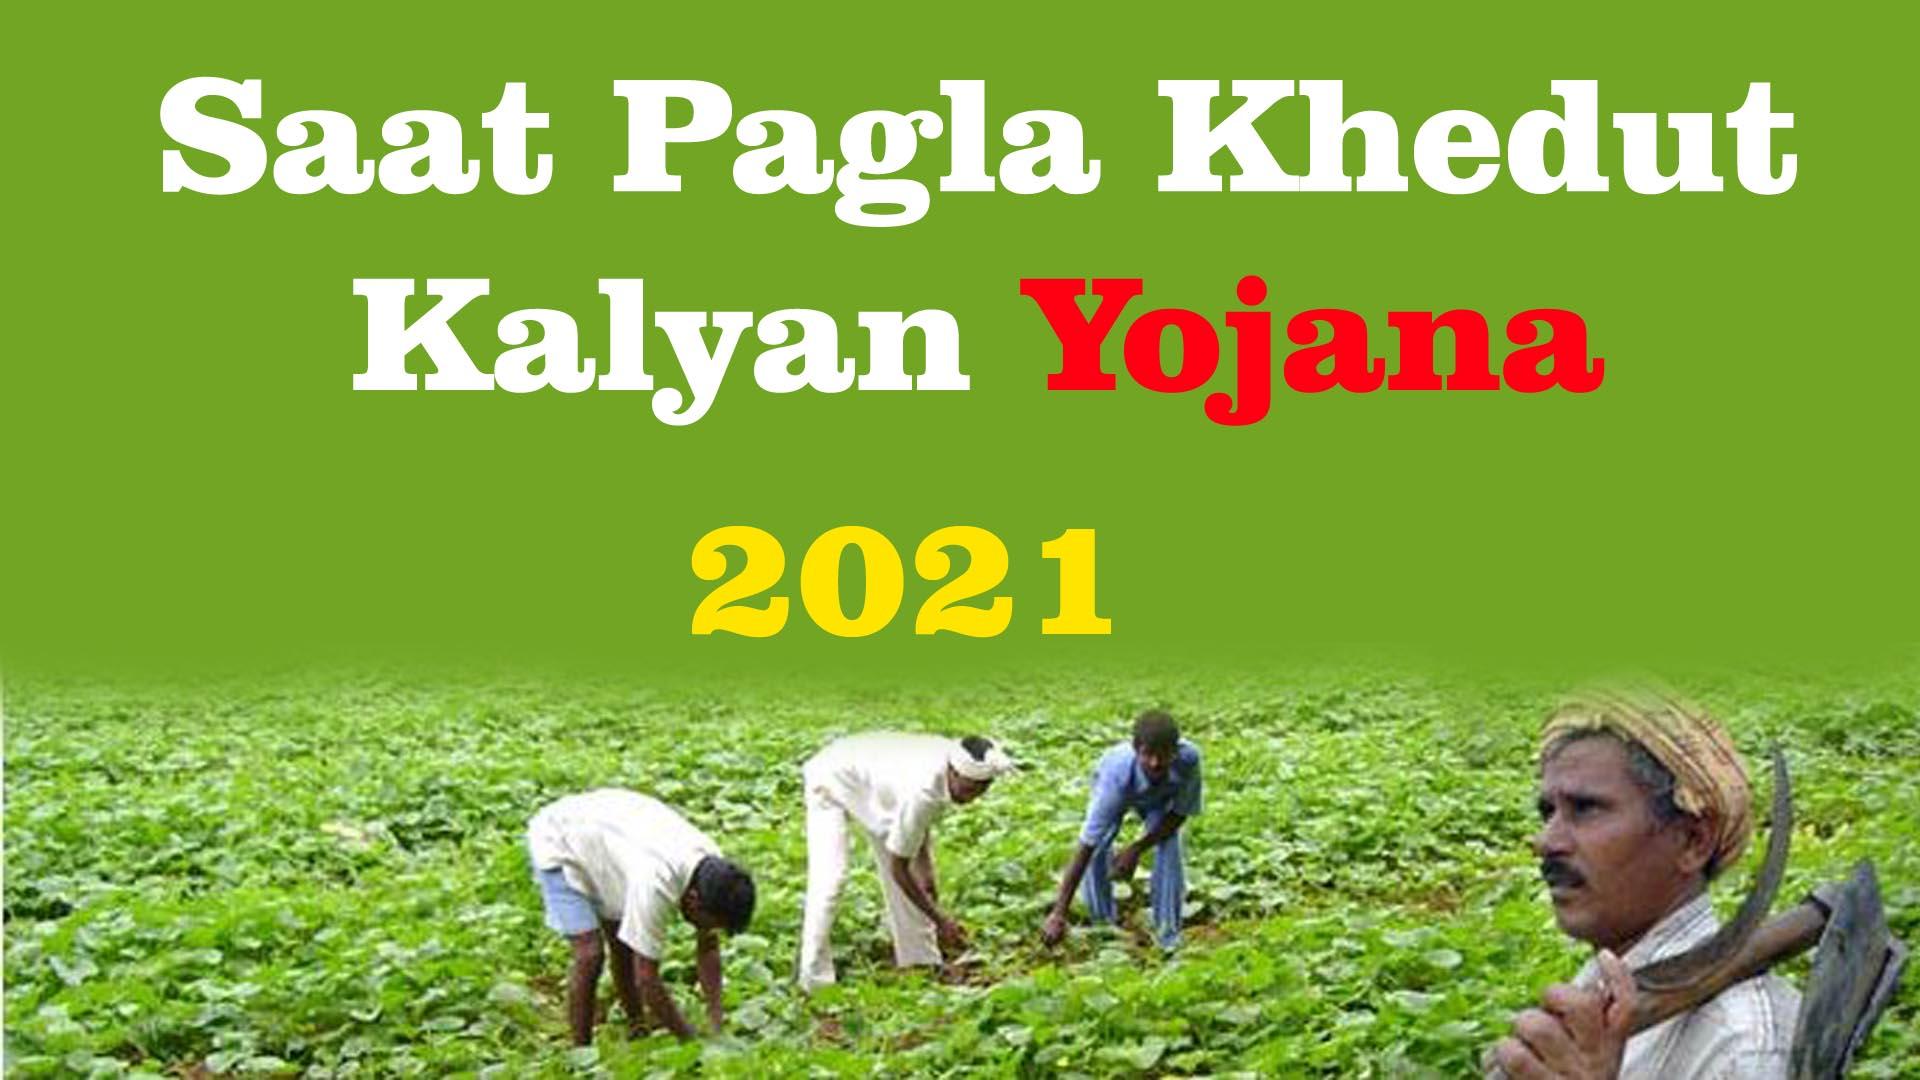 Gujarat Saat Pagla Khedut Kalyan Yojana 2021: Apply Online & Benefits